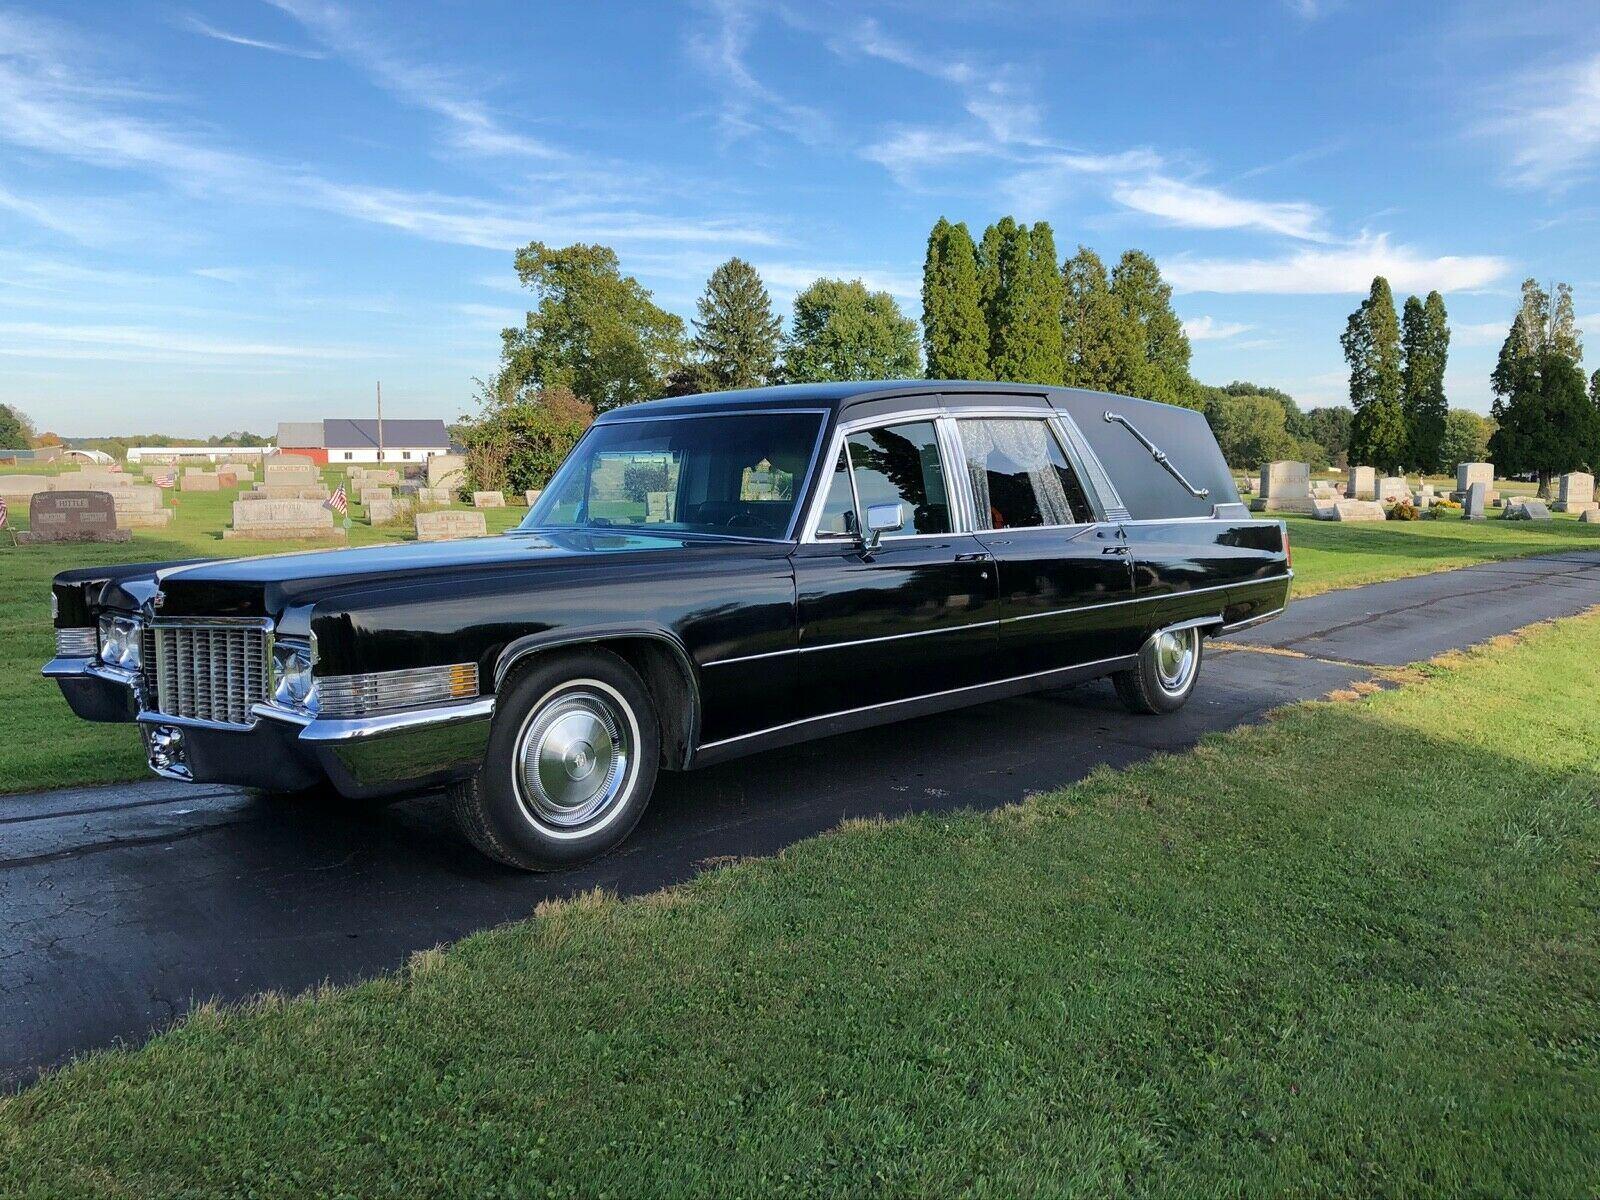 vintage 1970 Cadillac Superior hearse for sale